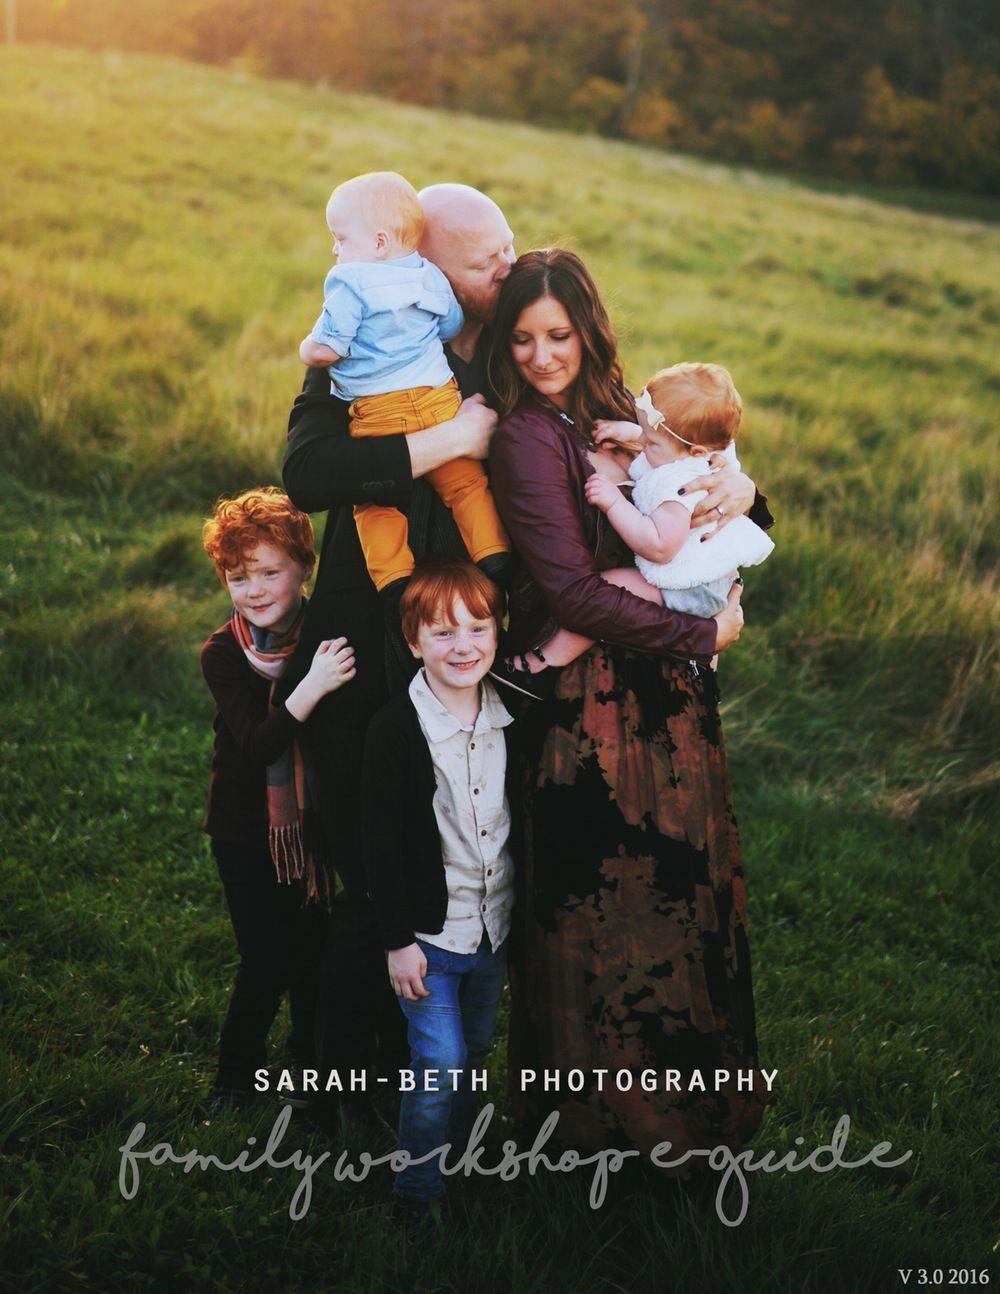 Image of Family Photography Workshop Guide v3.0 2017